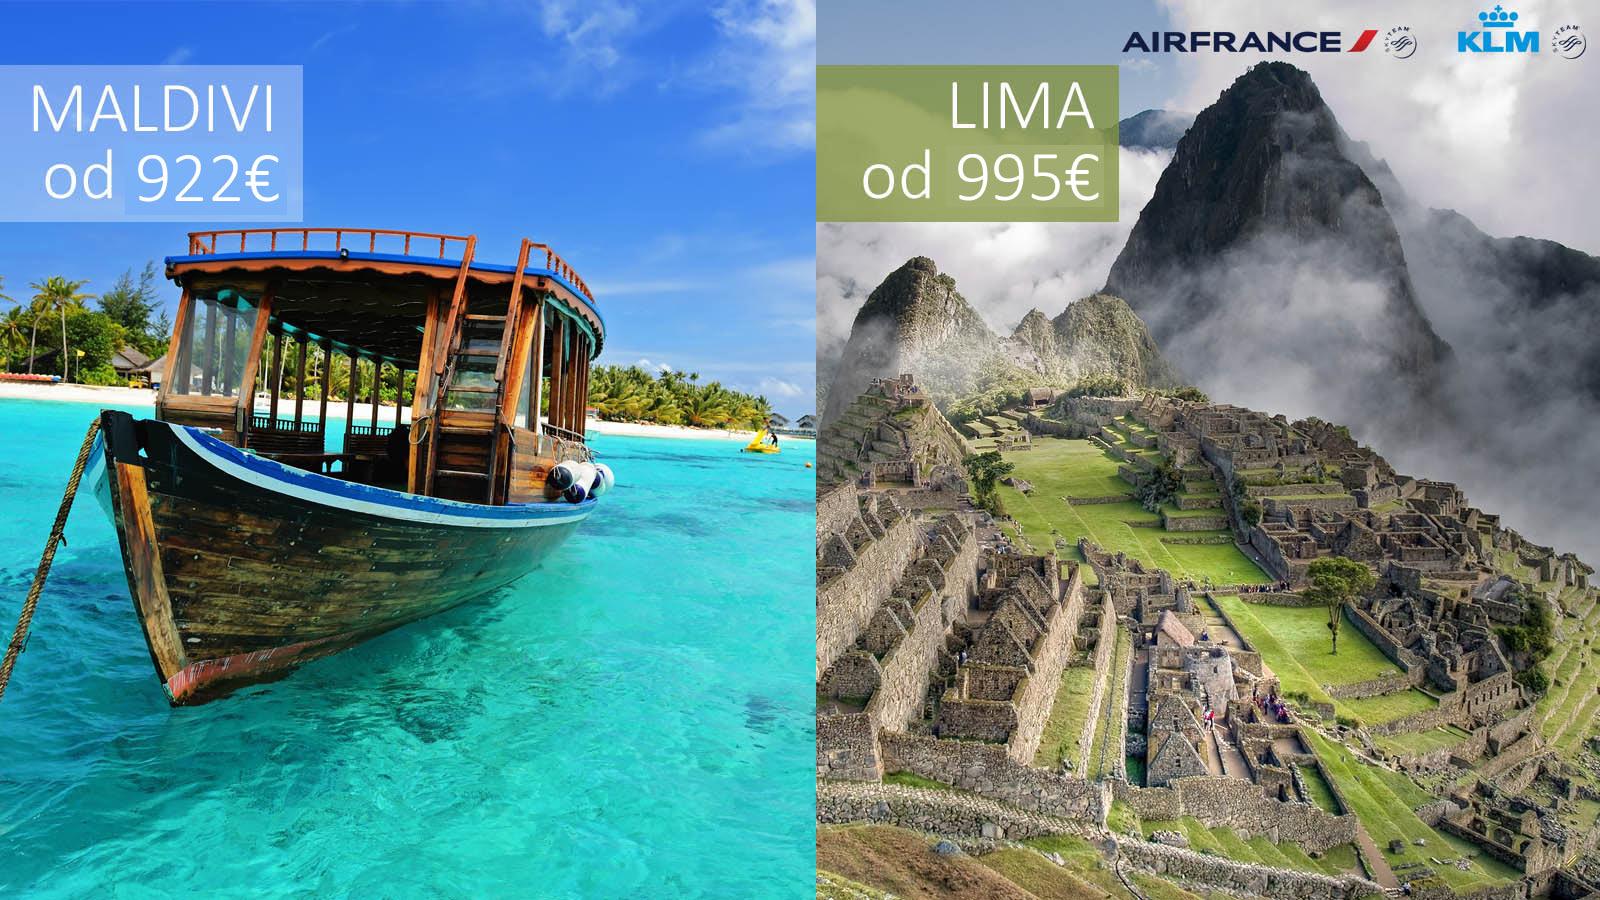 Maldivi-Lima-AirFrance-KLM